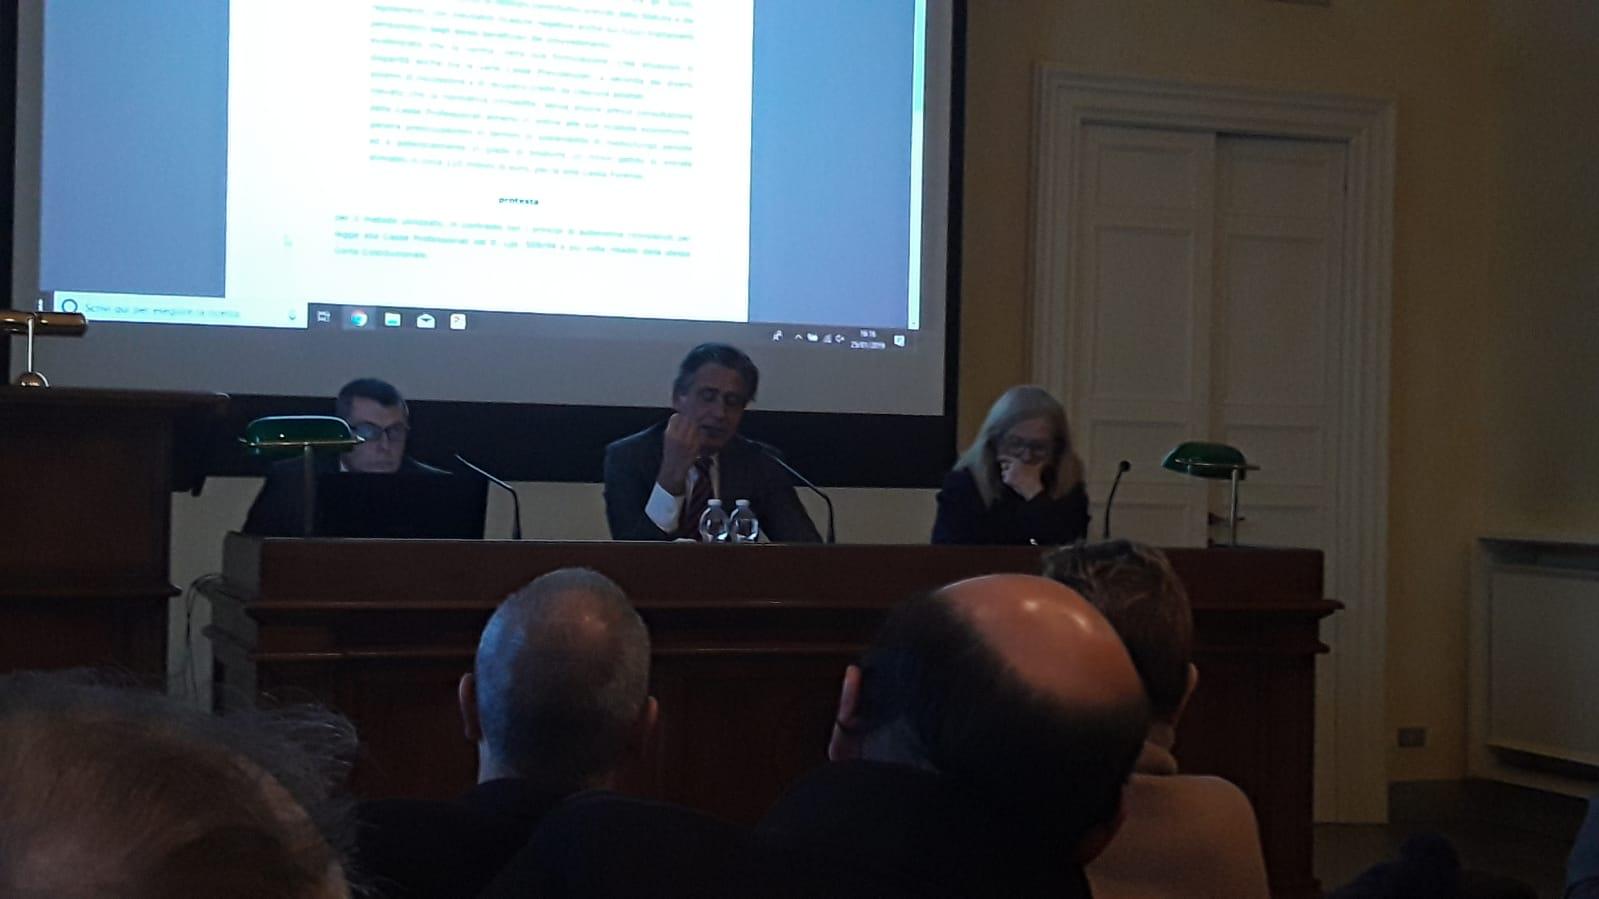 Convegno avvocati pavia Girolamo De Rada regole deontologiche